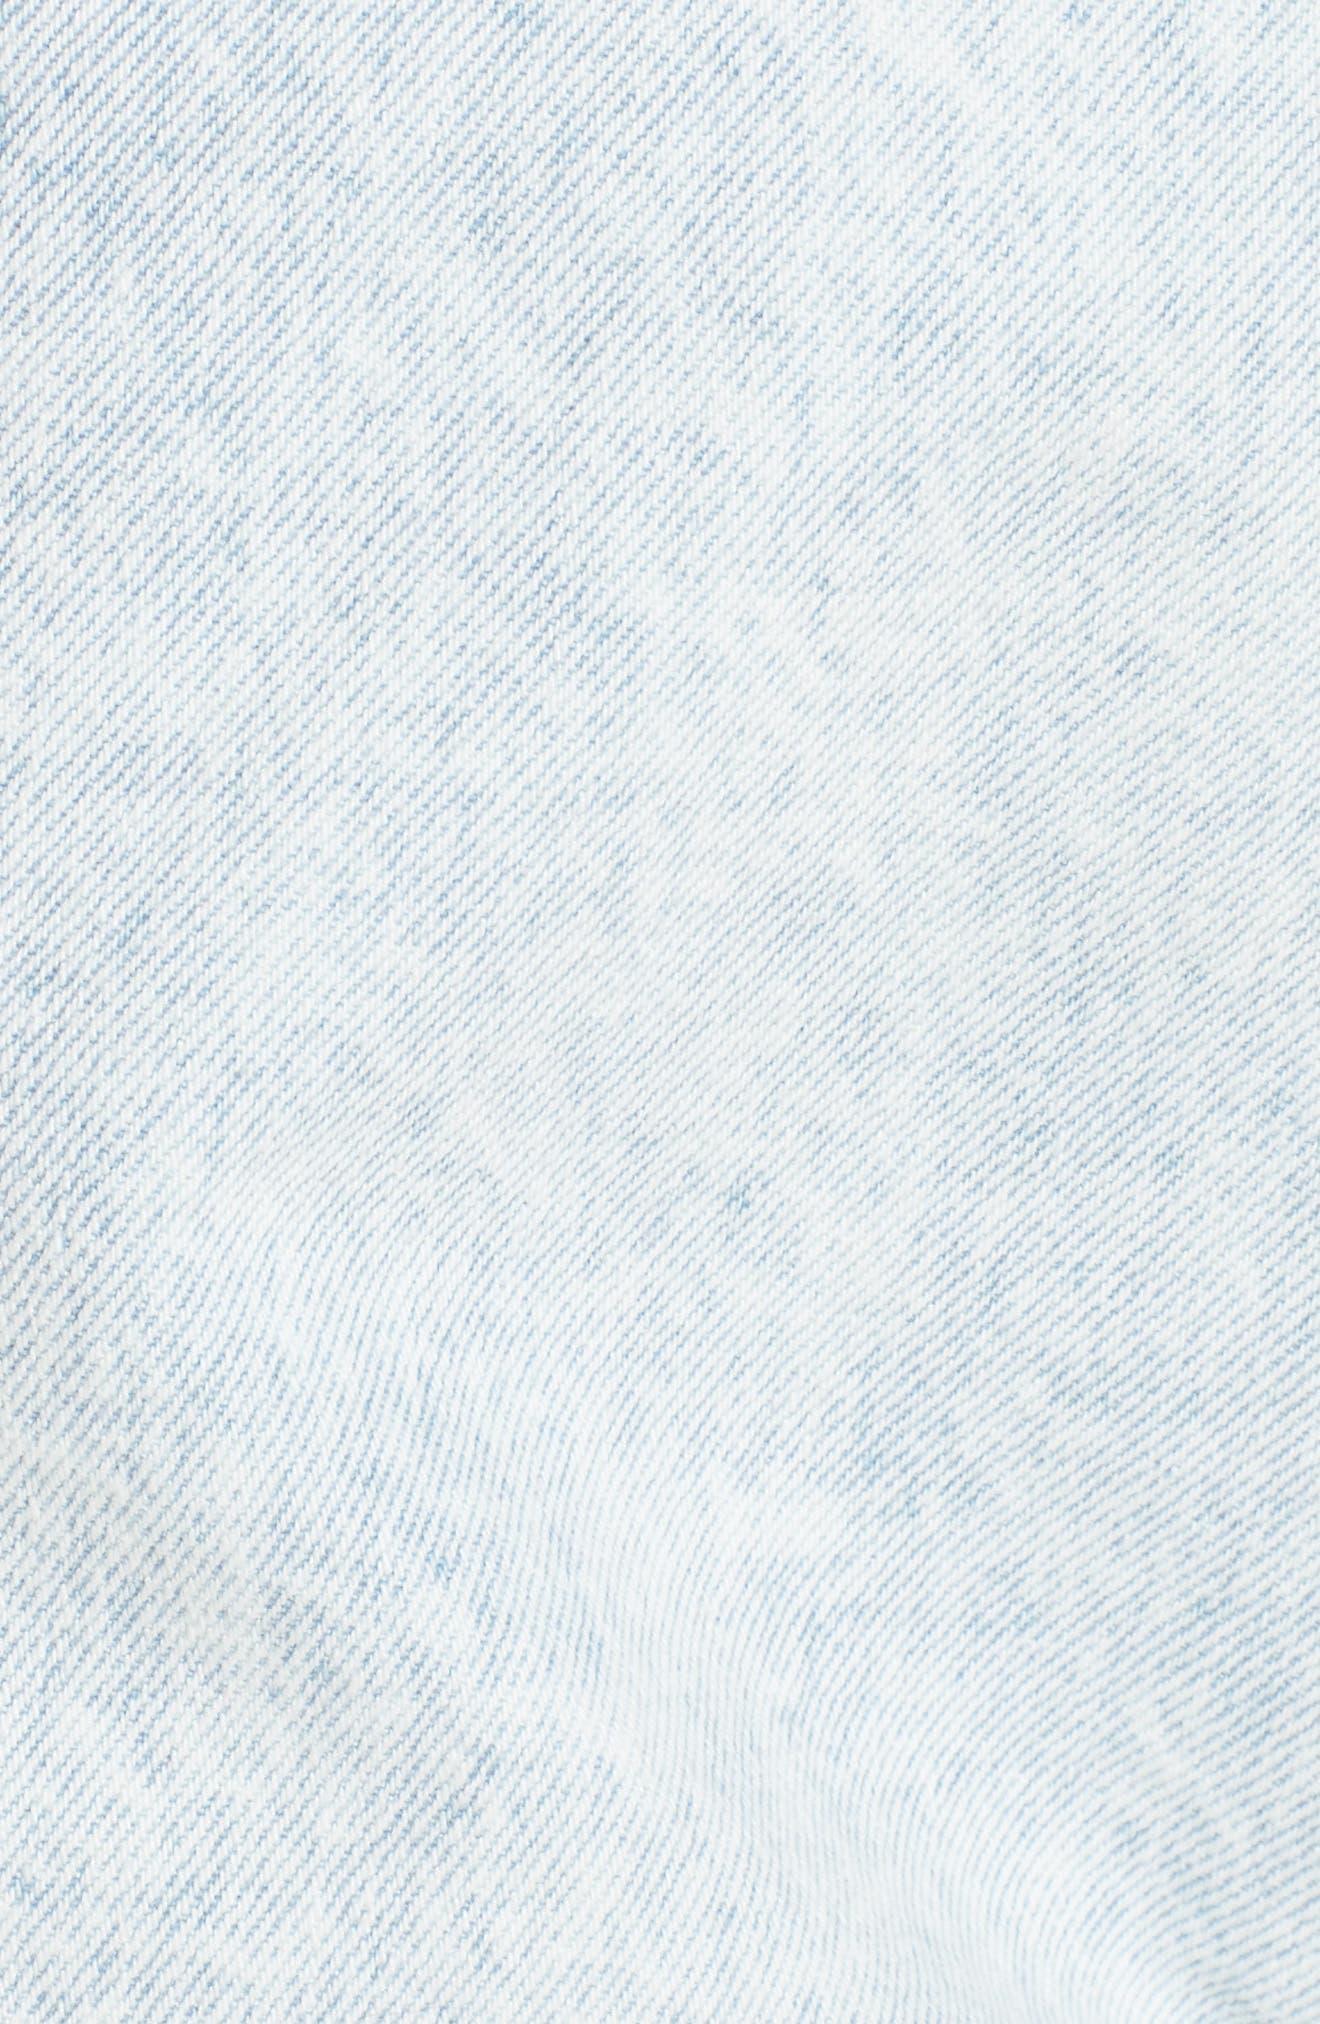 Unionbay Devo Acid Wash Denim Shorts,                             Alternate thumbnail 5, color,                             Icy Wash